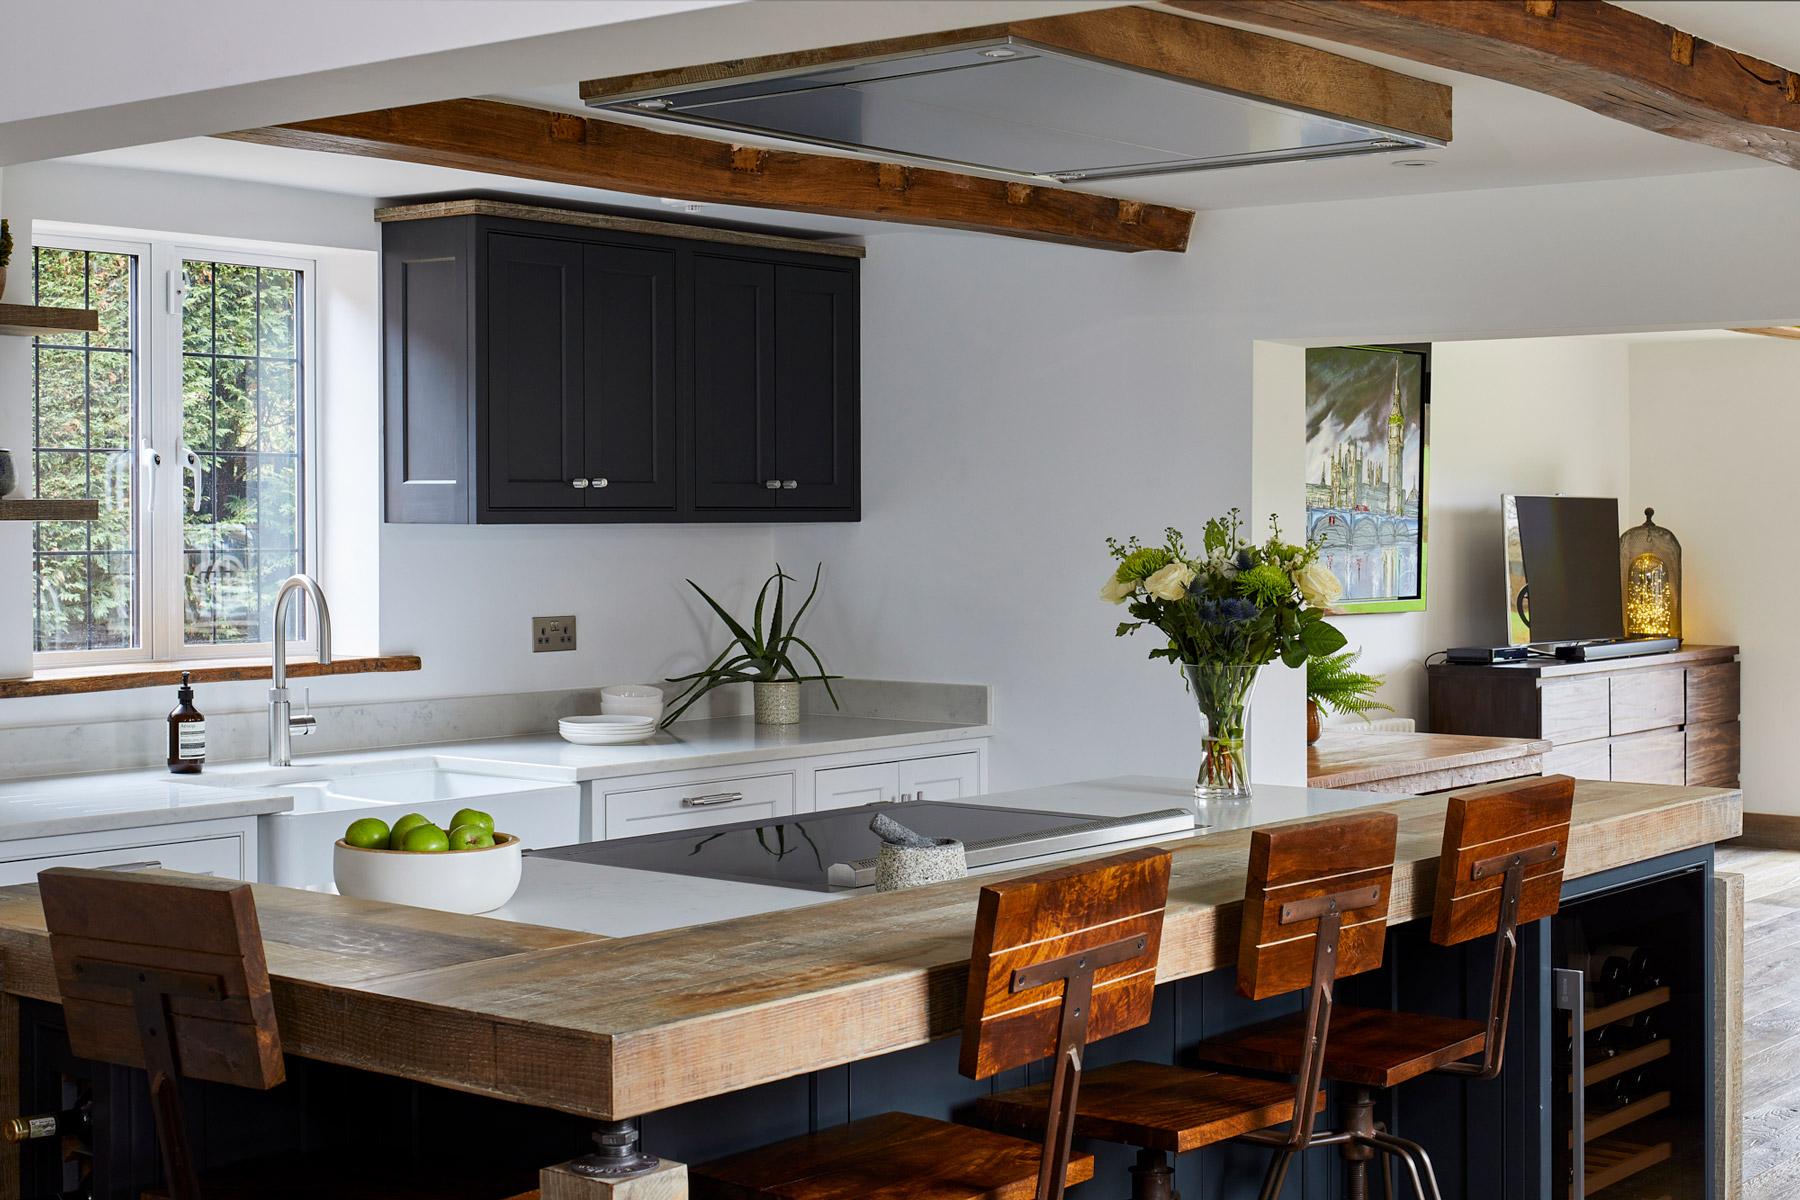 Reclaimed industrial kitchen